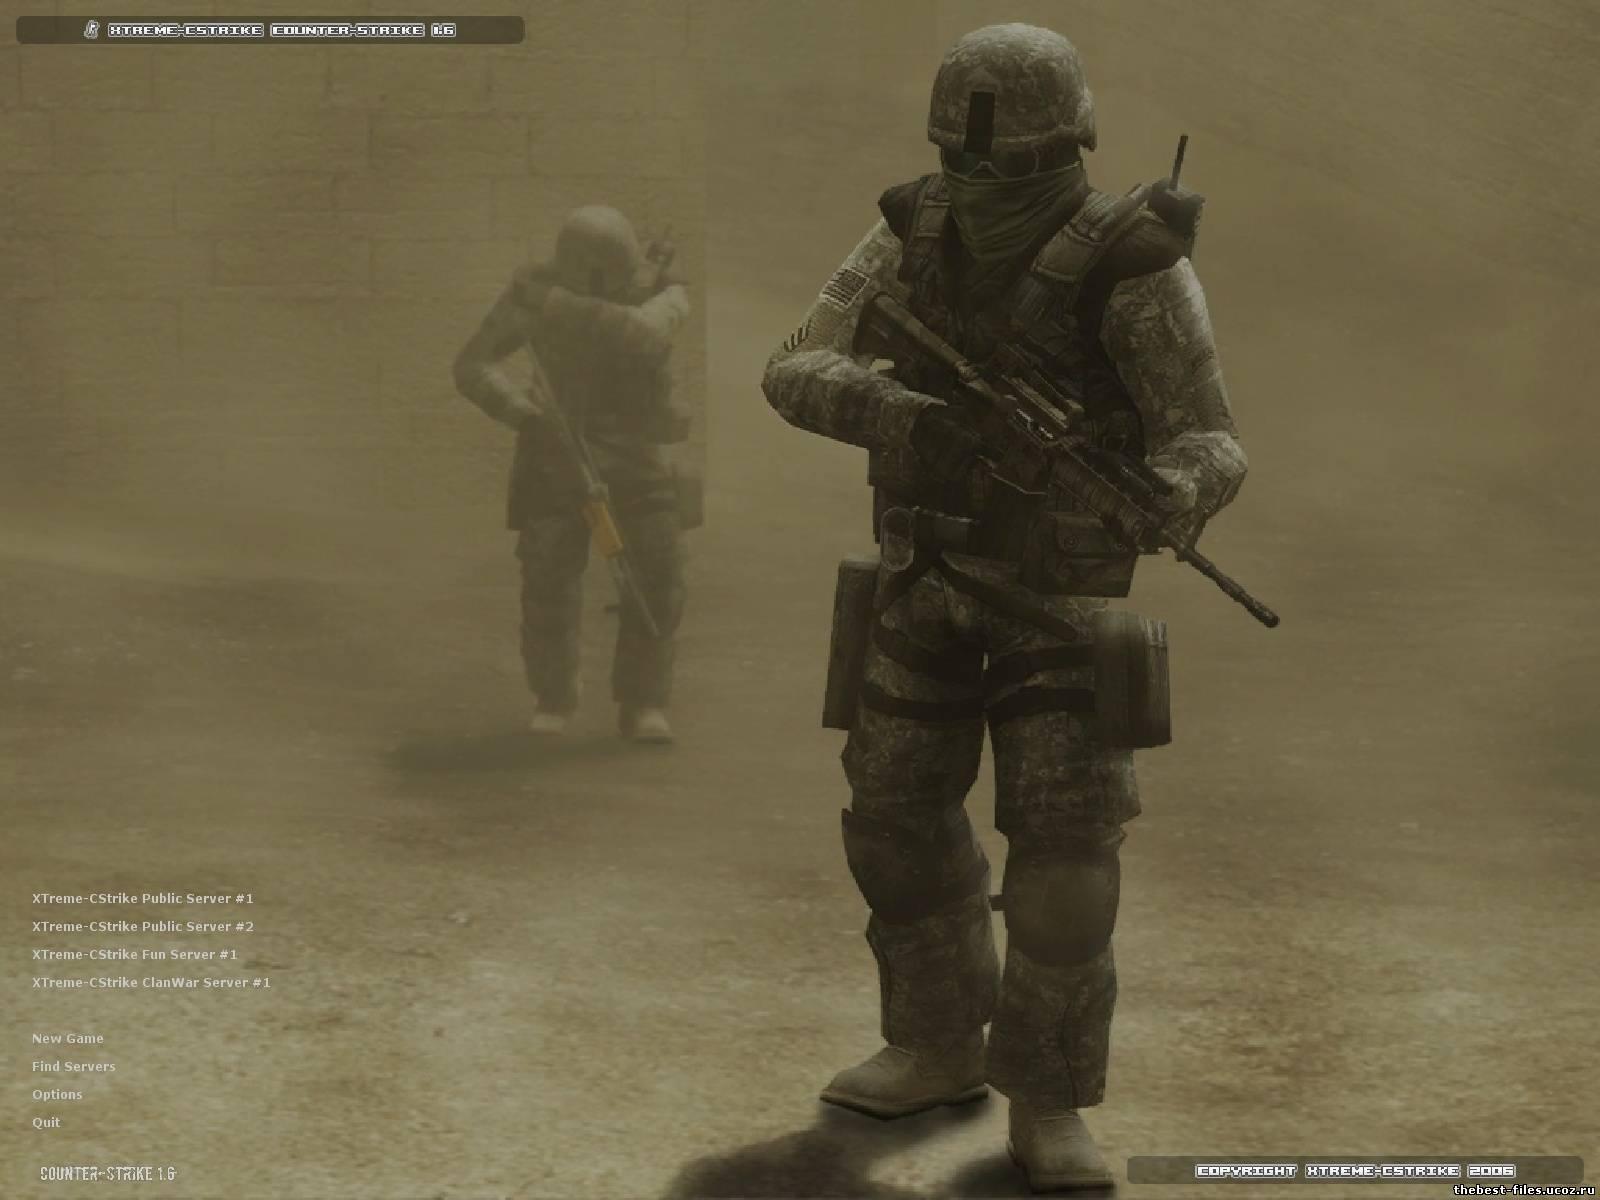 Скачать Counter-Strike 1.6 Final v31 for Kaz Net 2008 бесплатно и без